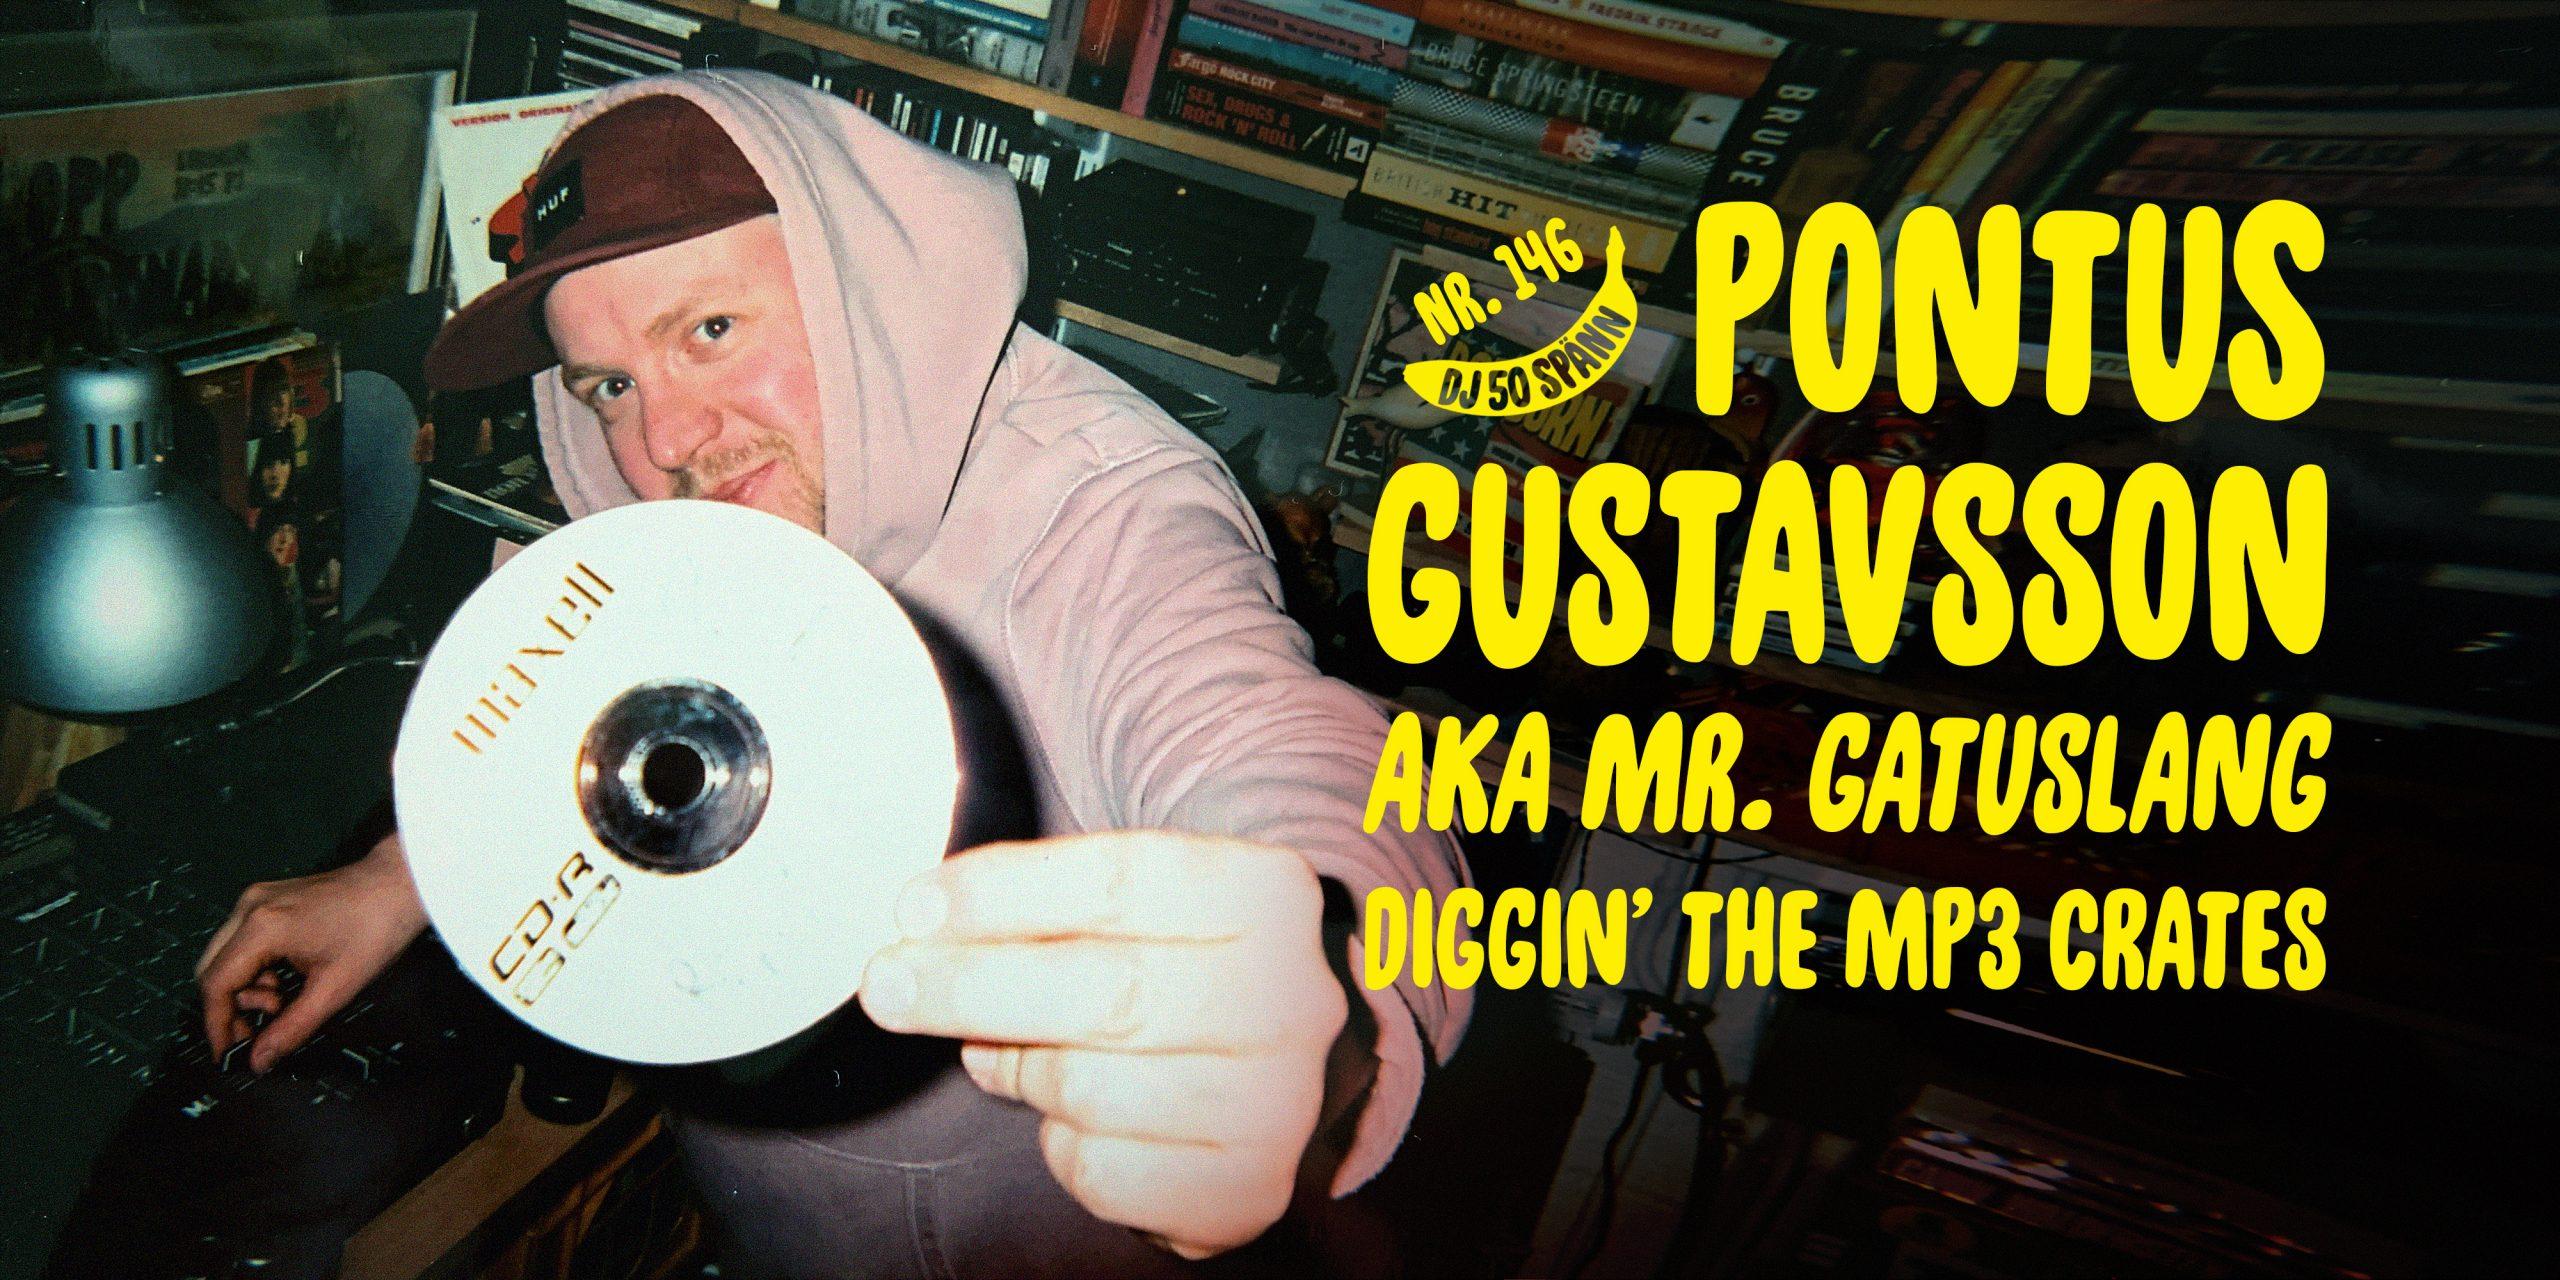 DJ50:- med Pontus Gustavsson [Gatuslang]